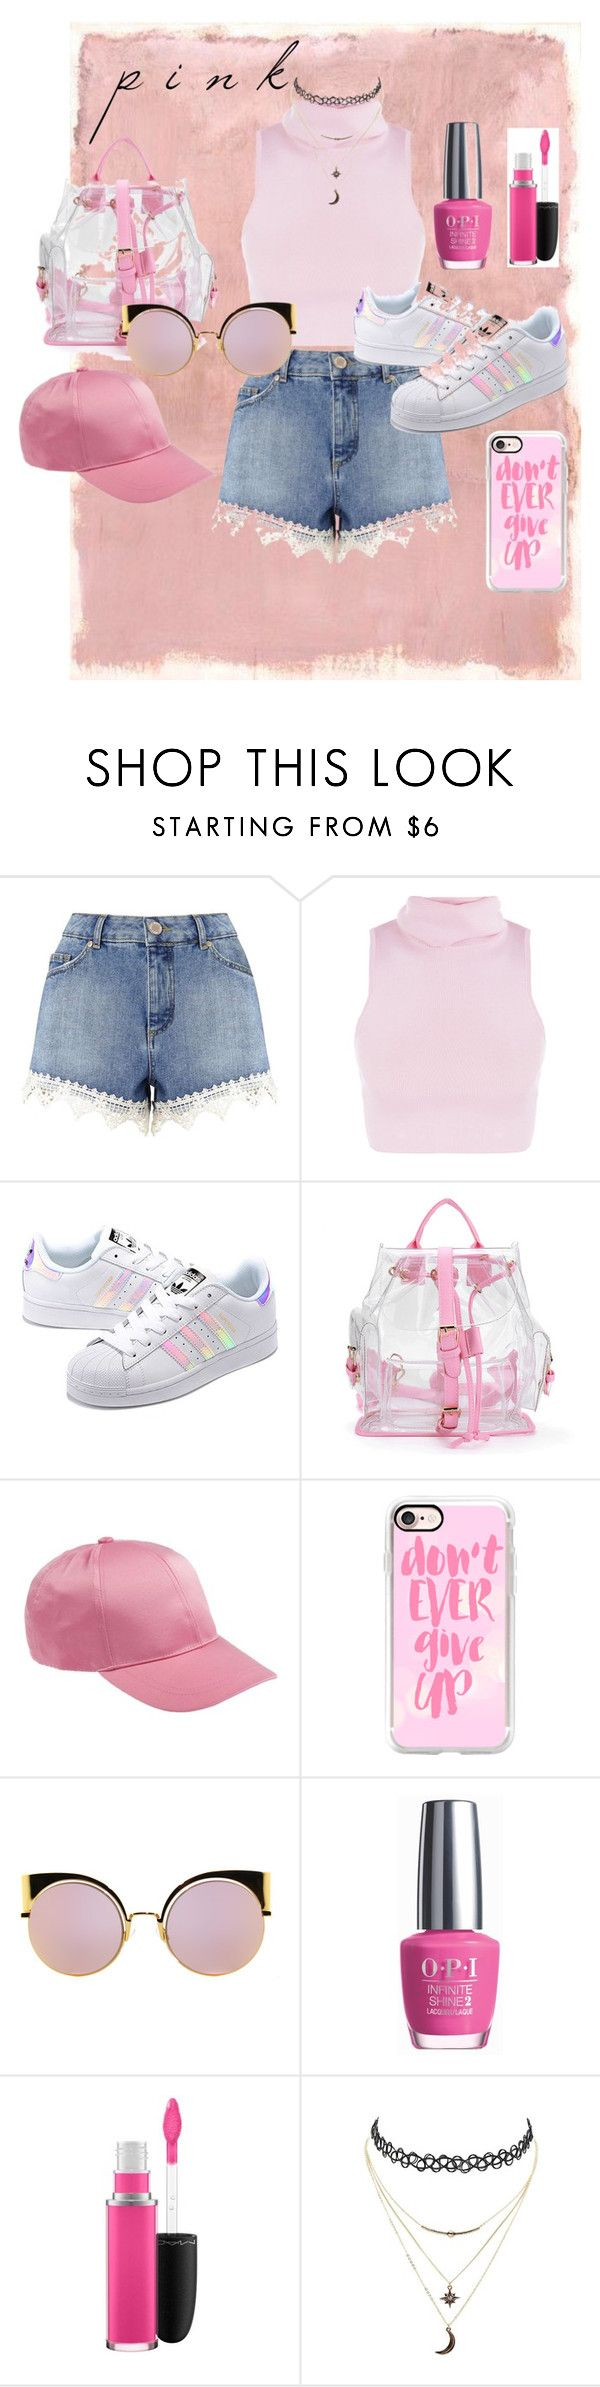 """pink chic"" by soffrolon on Polyvore featuring moda, Rothko, Miss Selfridge, adidas Originals, Casetify, Fendi, OPI, MAC Cosmetics y Charlotte Russe"